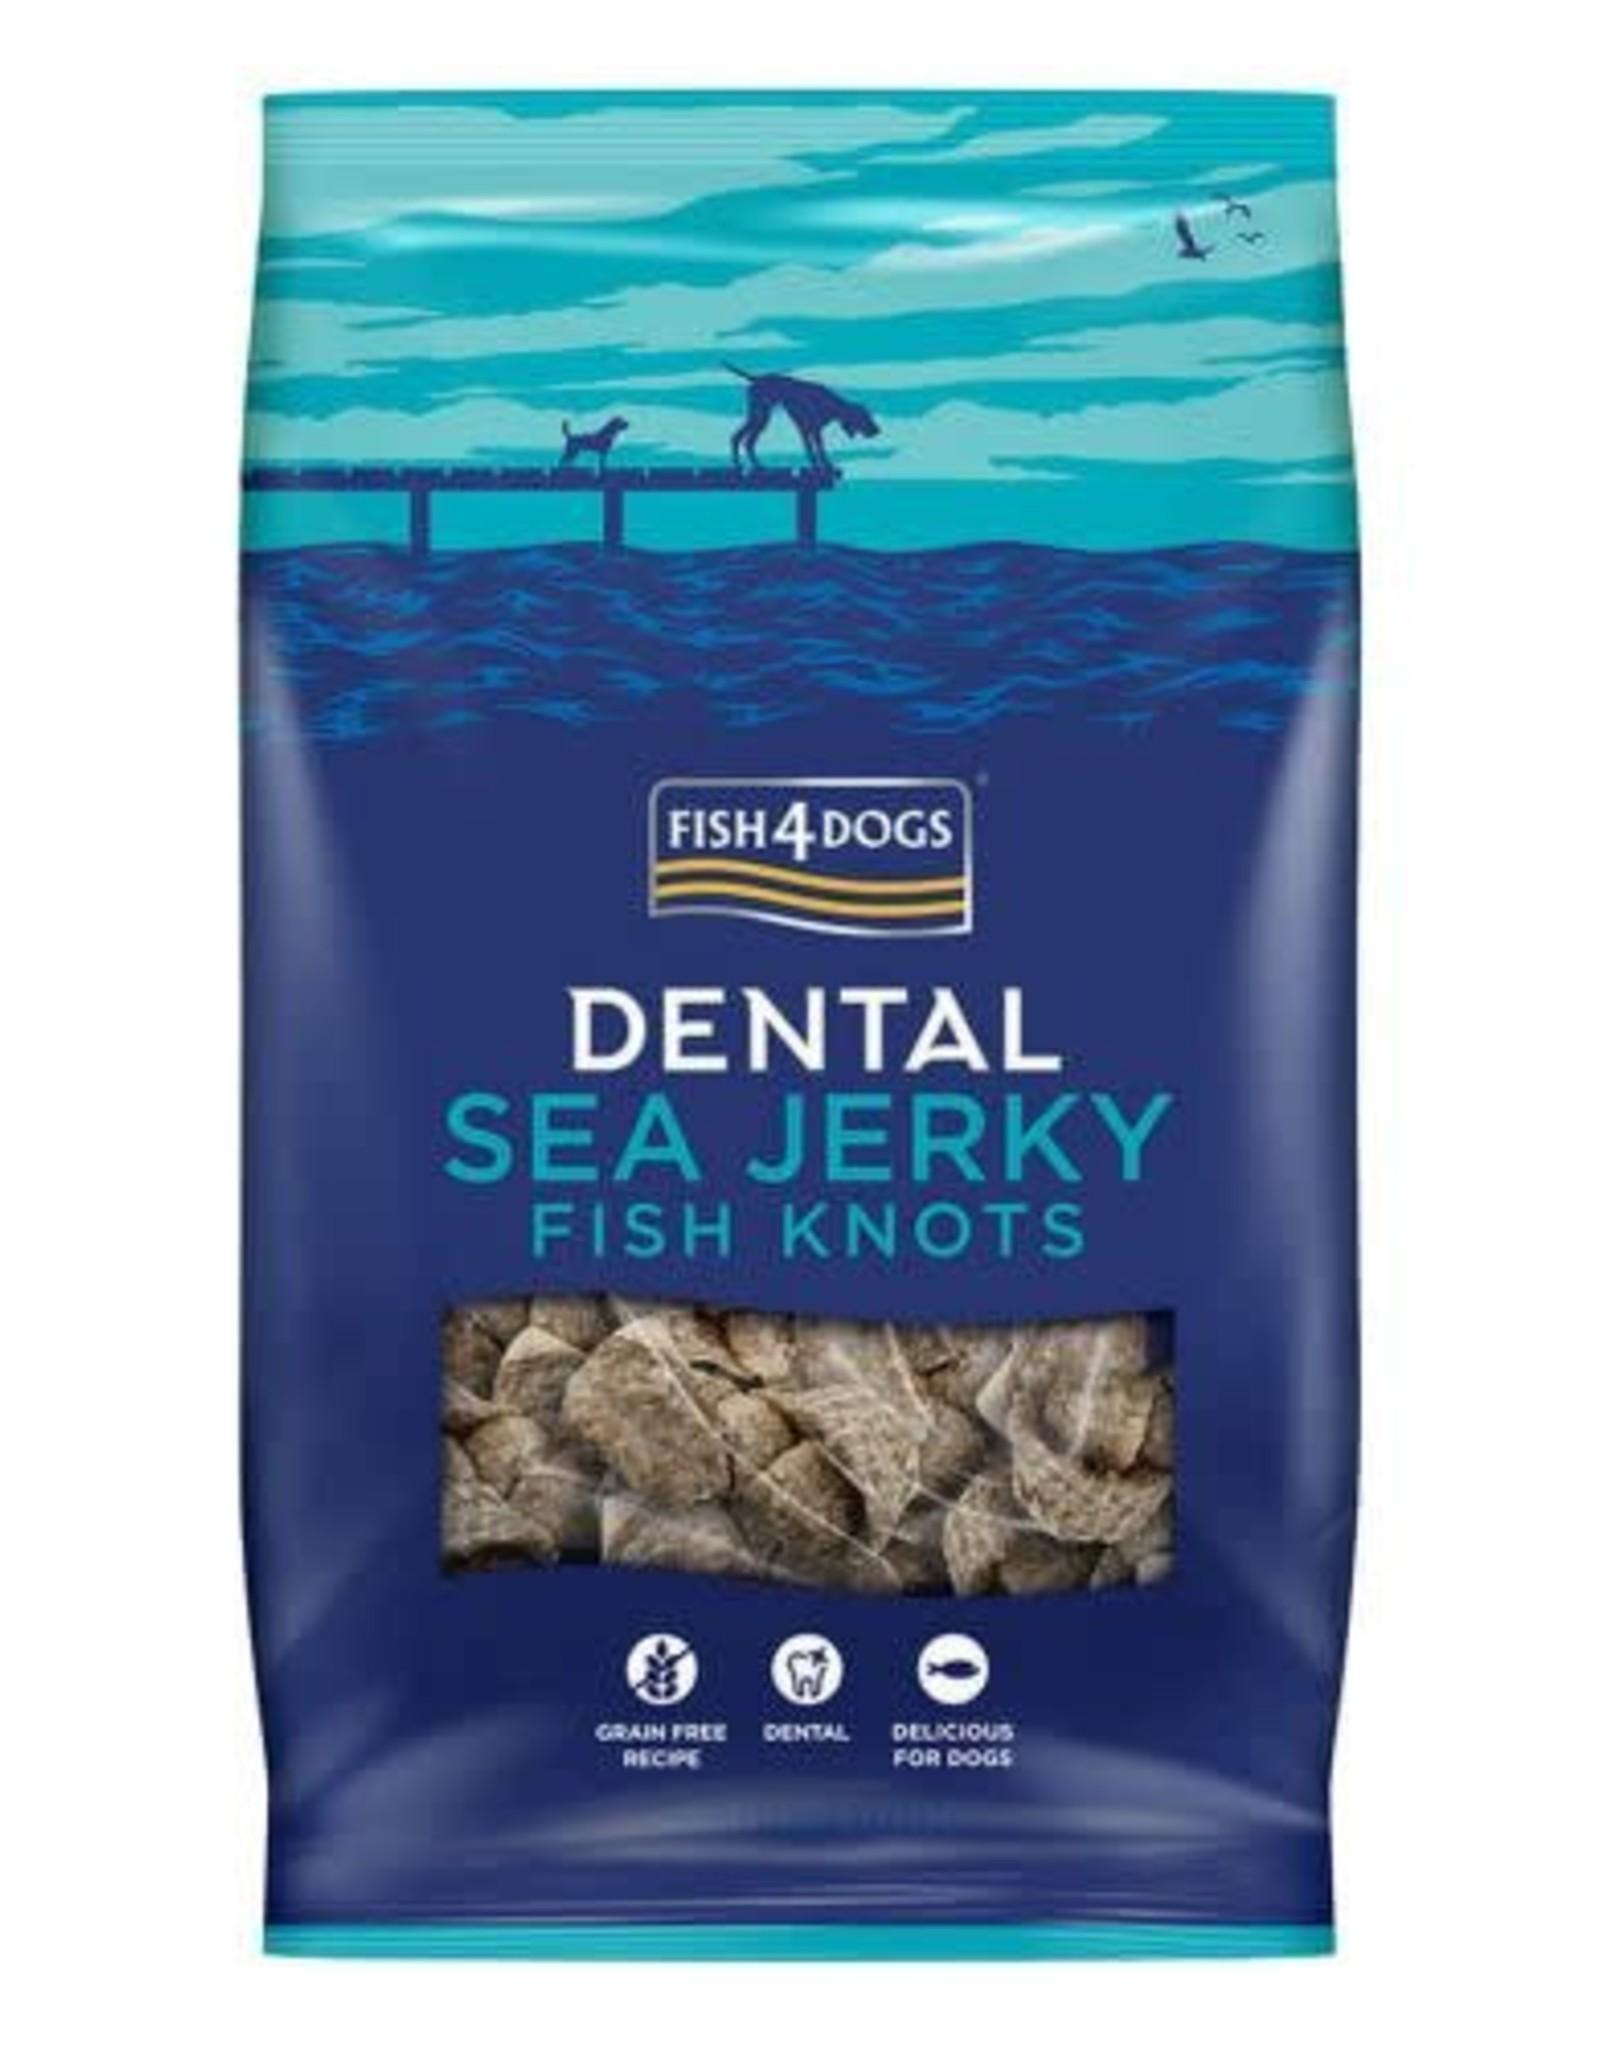 Fish4Dogs Dental Sea Jerky Fish Knots Dog Chews, 100g